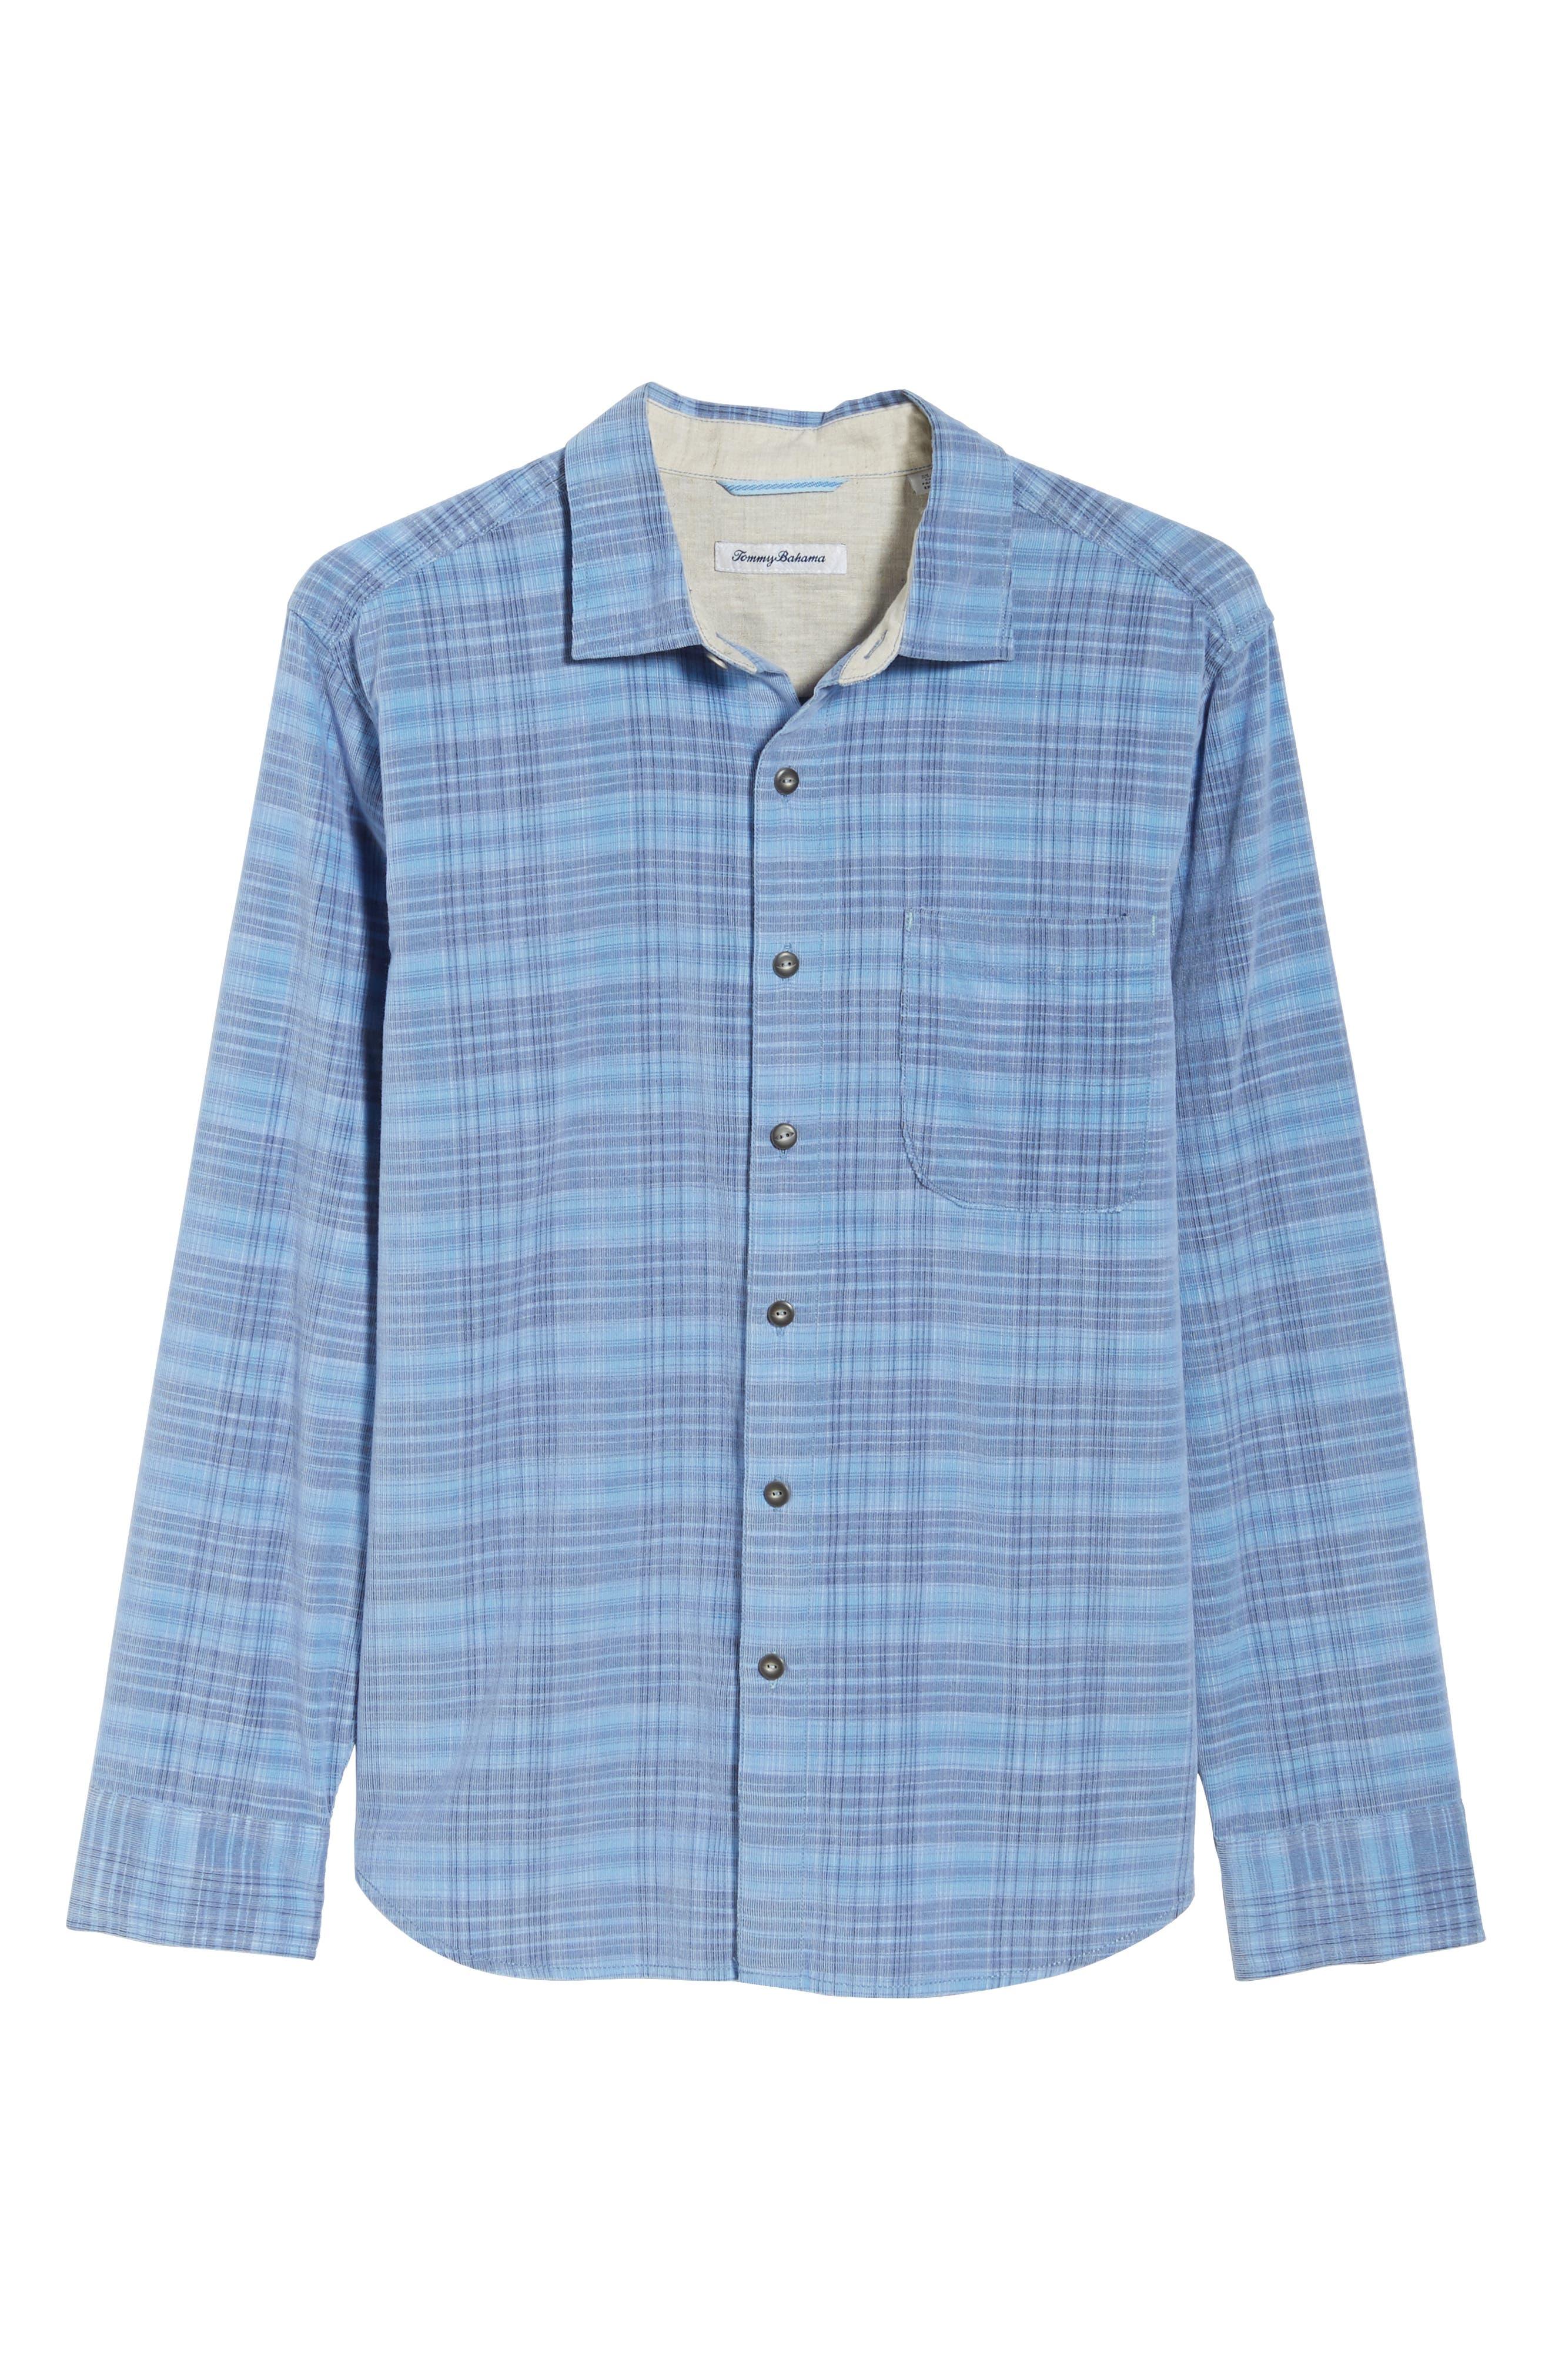 Cruzy Plaid Corduroy Sport Shirt,                             Alternate thumbnail 6, color,                             RIVIERA AZURE